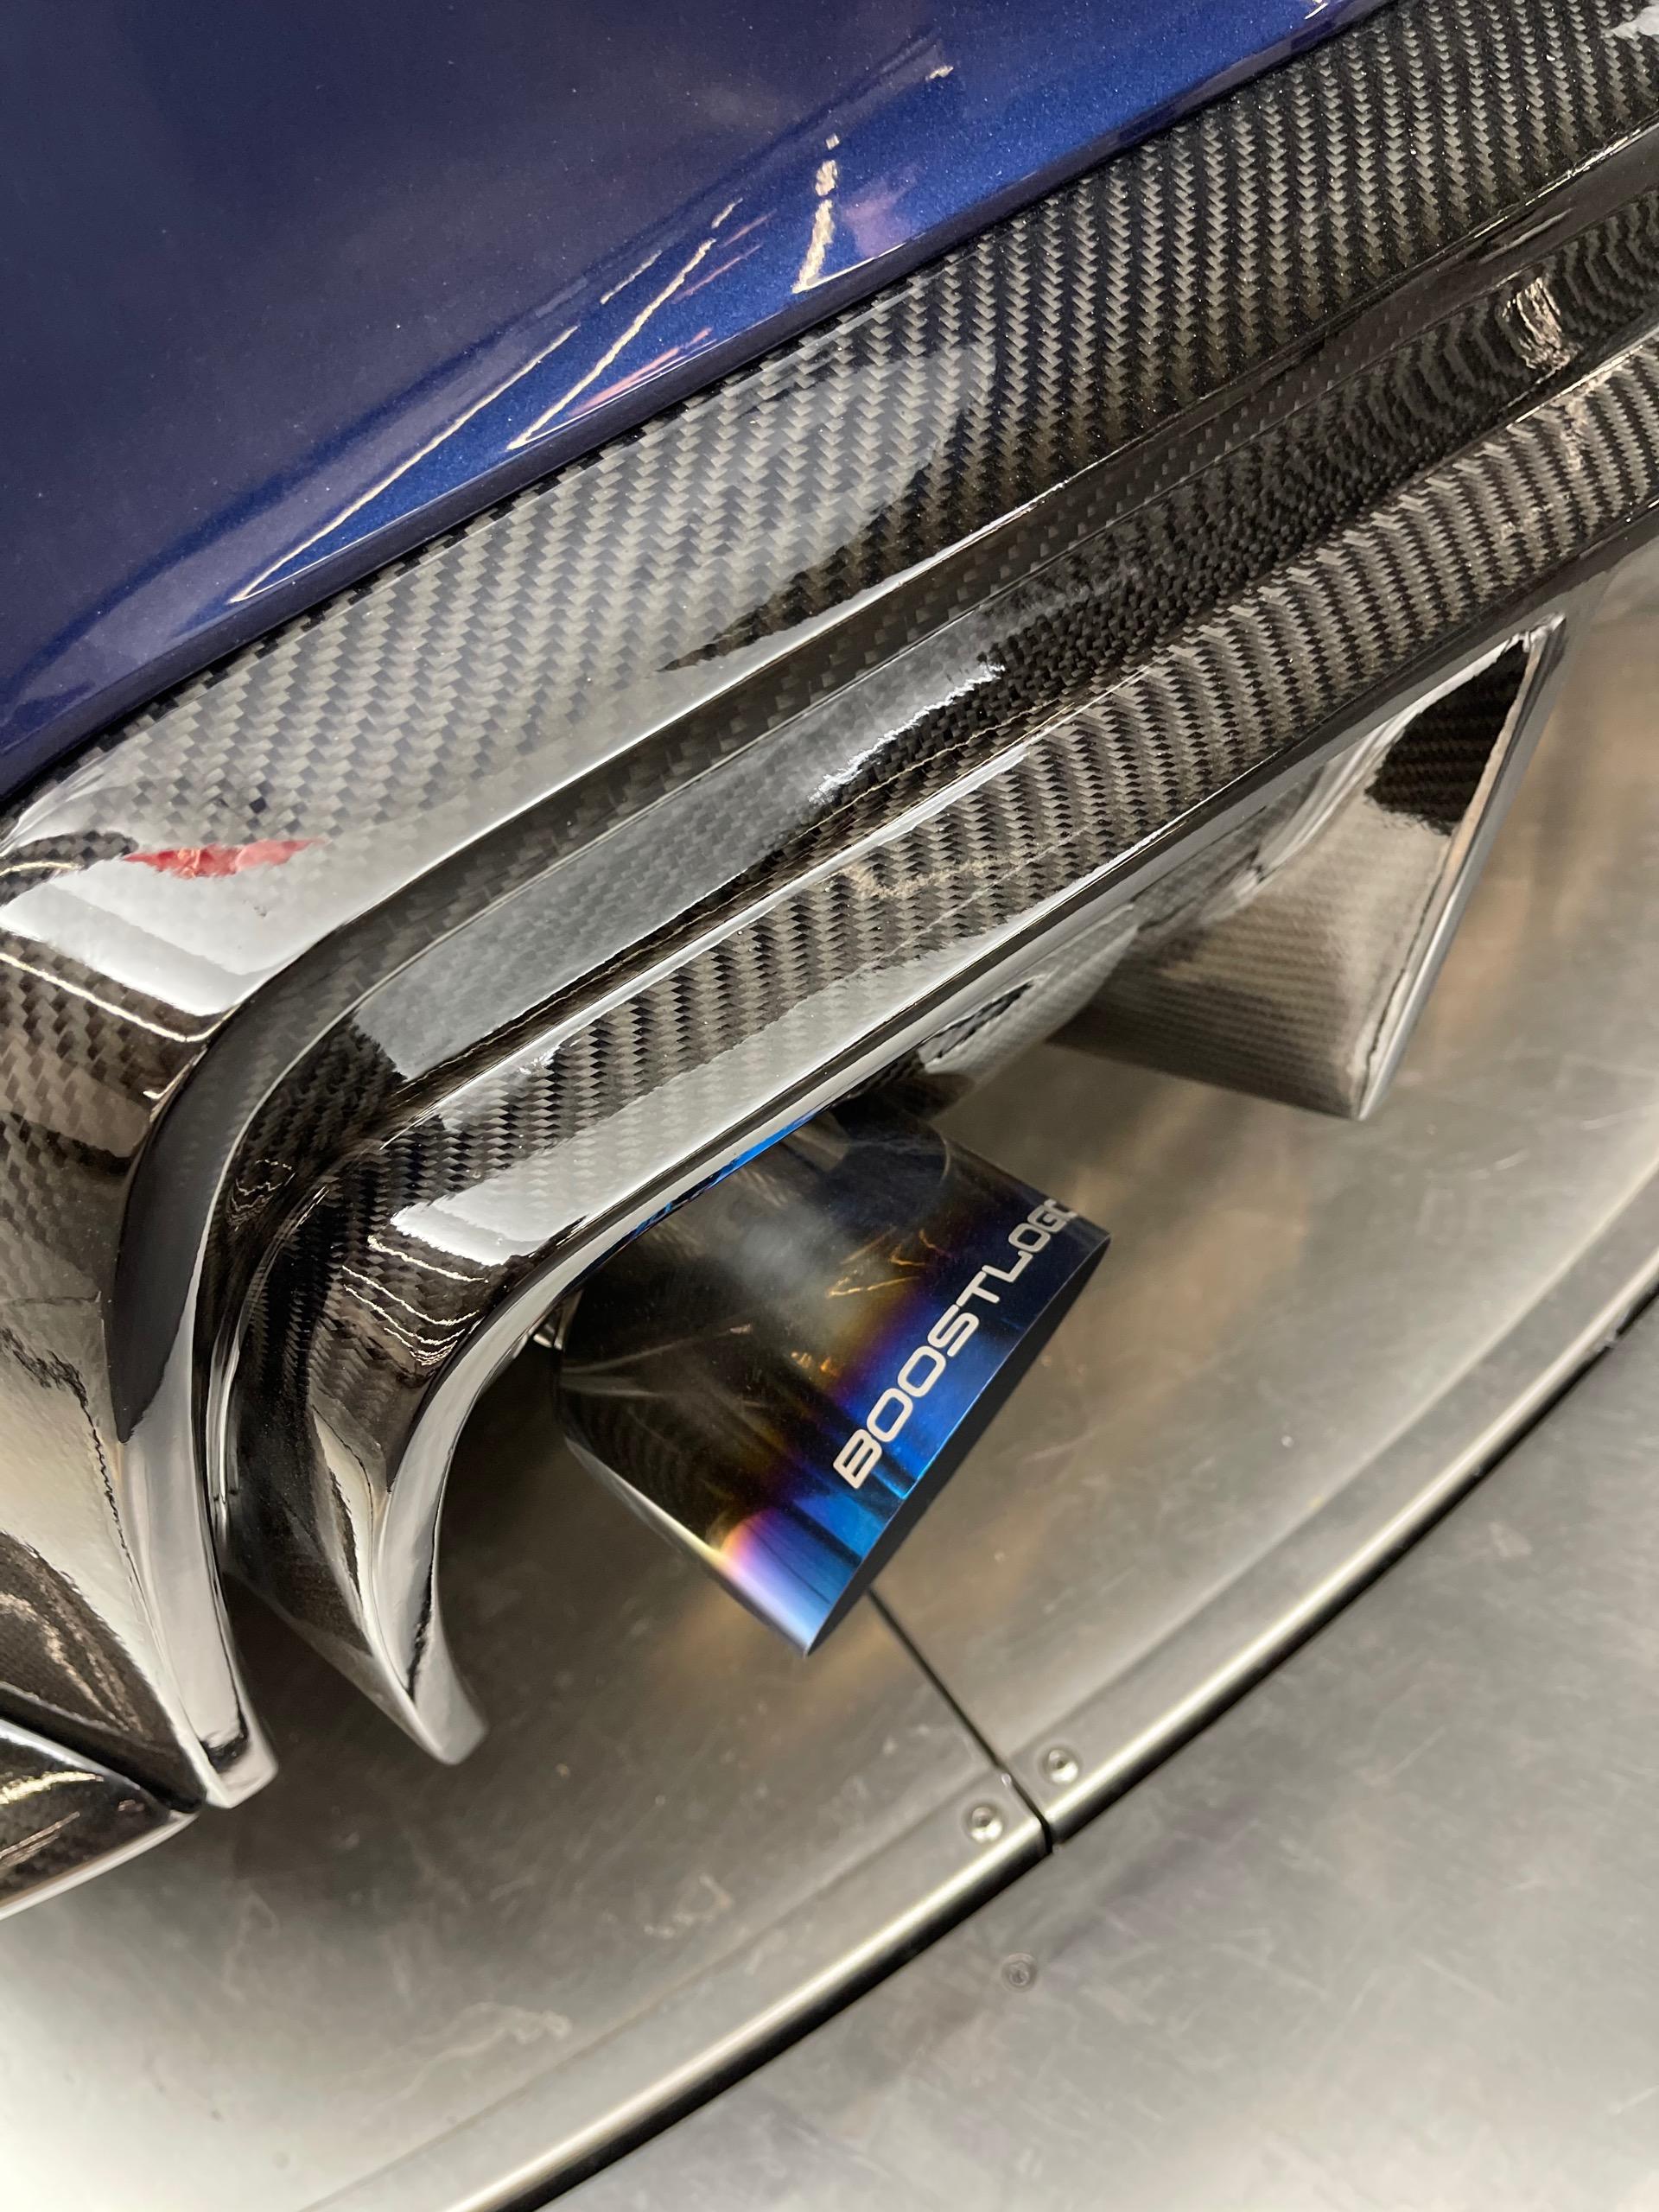 Used-2020-Toyota-GR-Supra-30-Premium-BOOST-LOGIC-Upgrades-6k-Miles